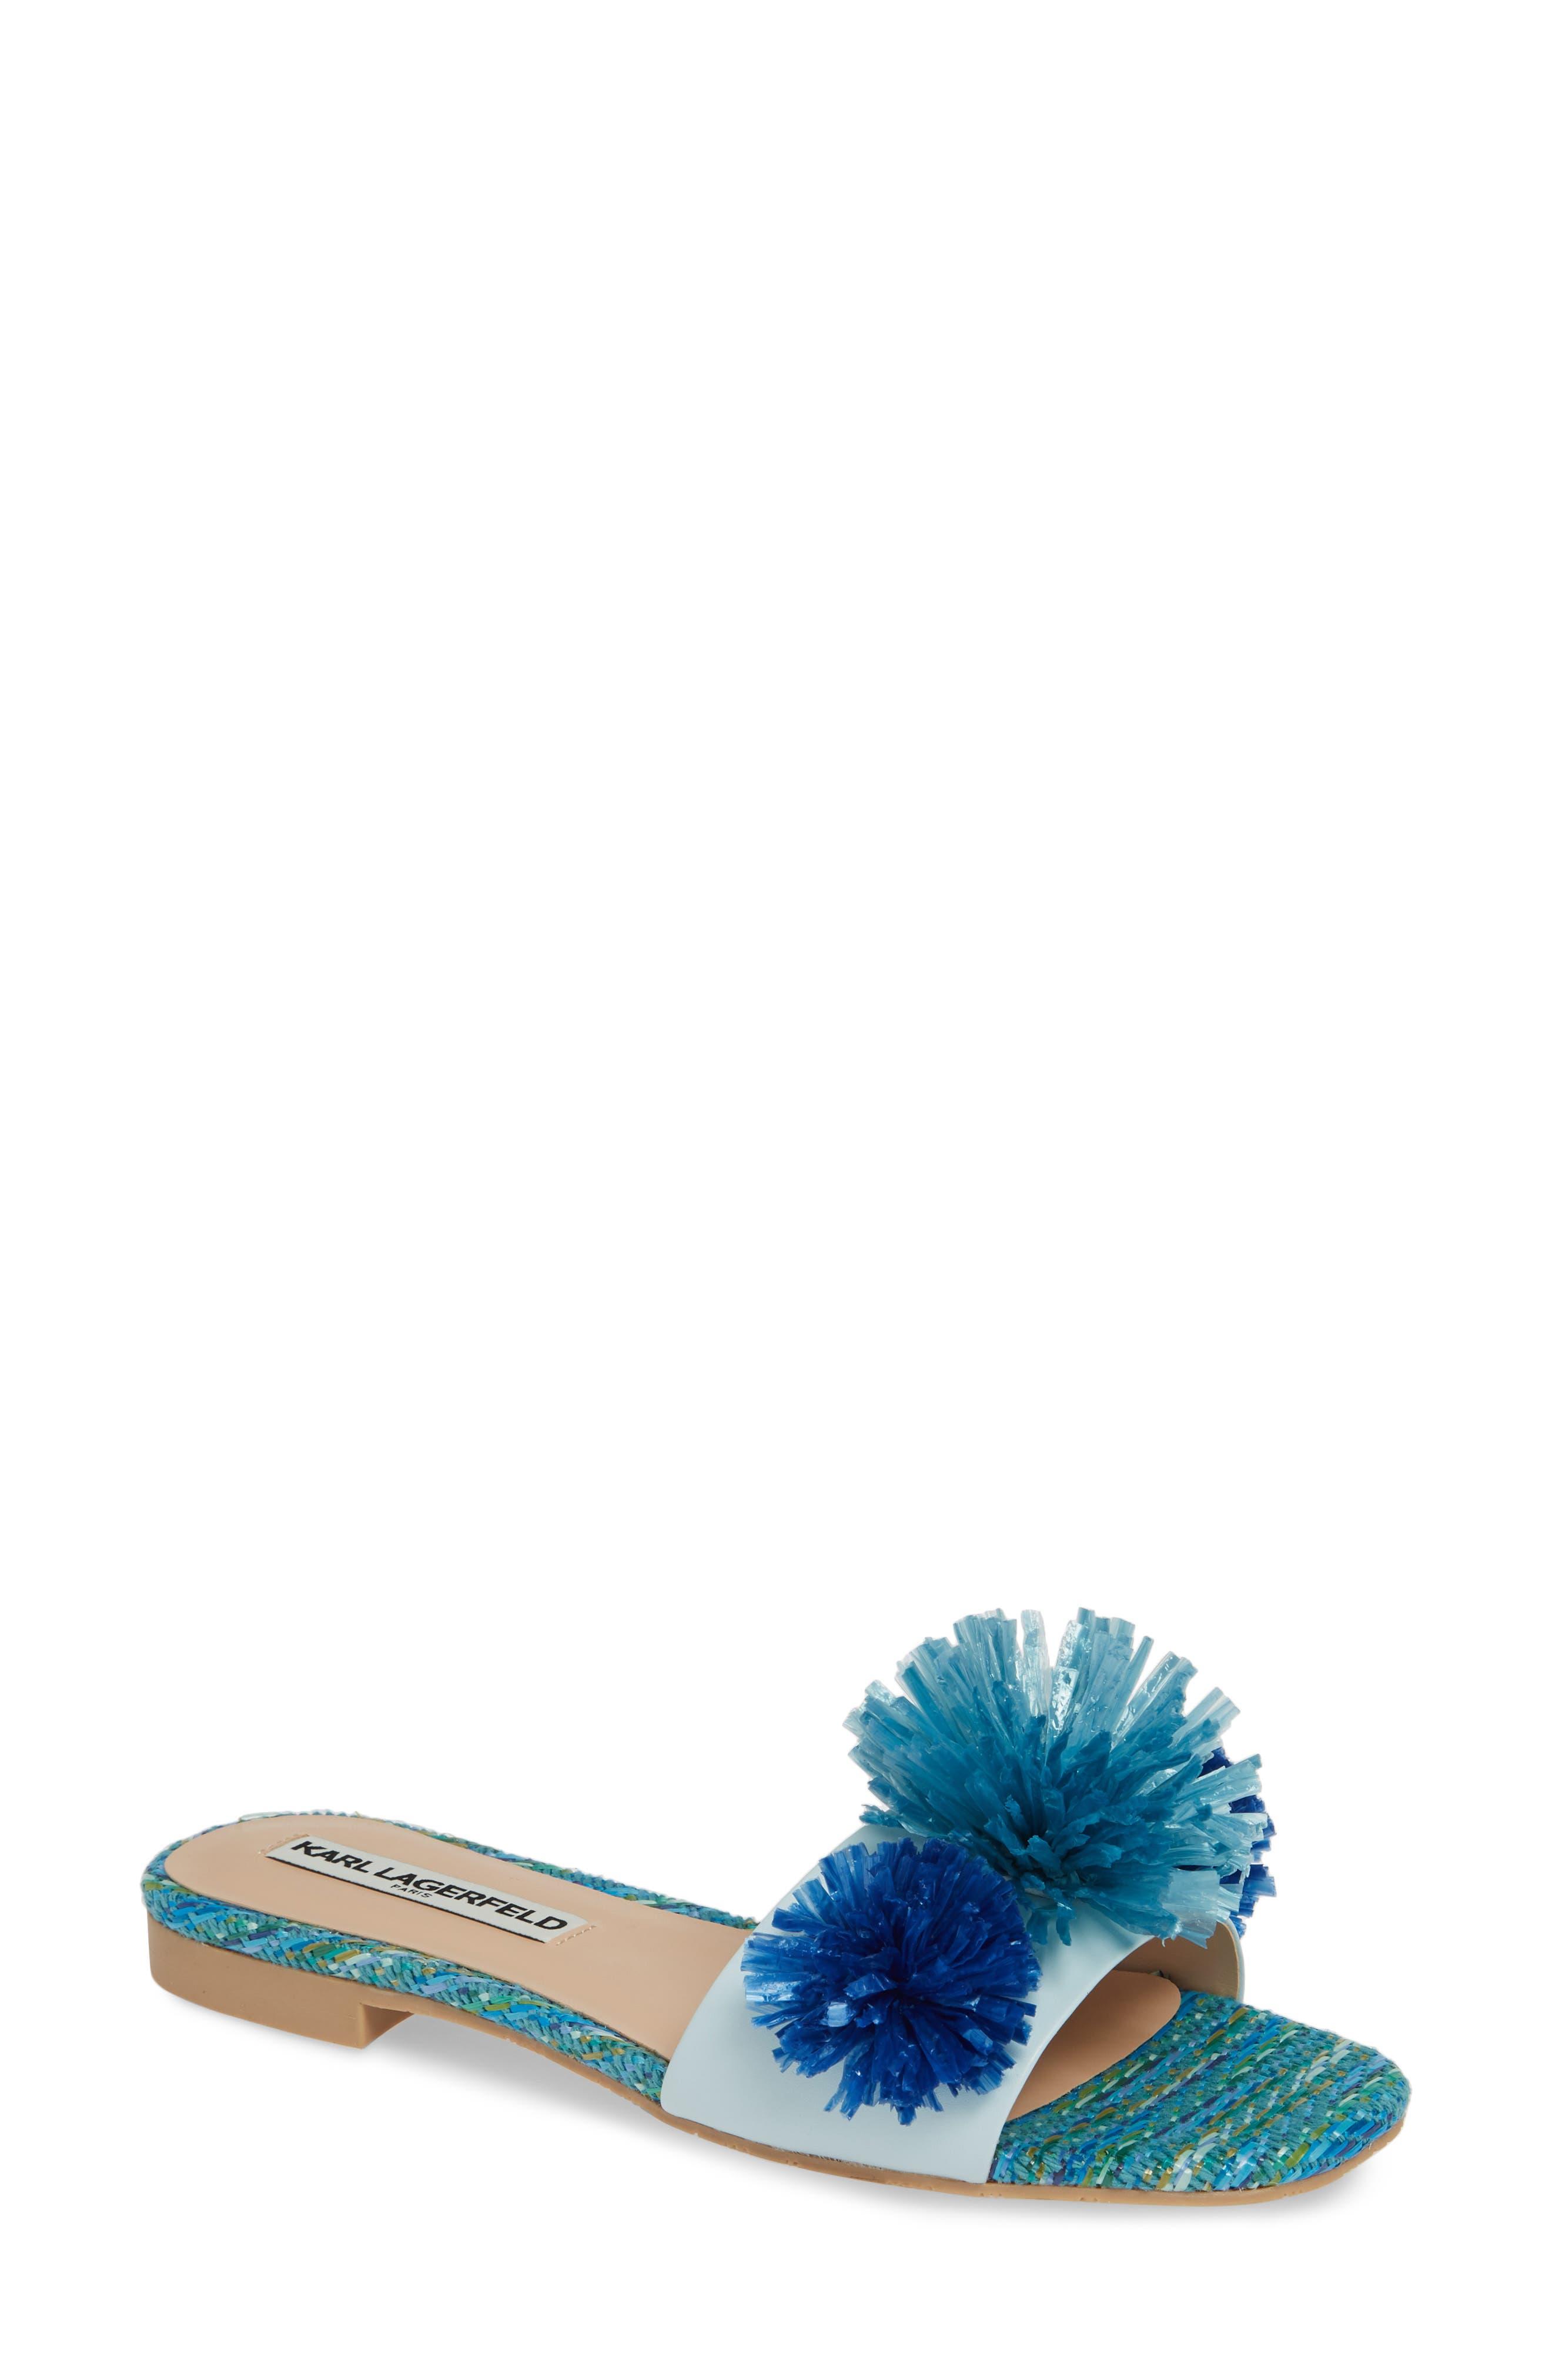 Karl Lagerfeld Paris Rainey Slide Sandal, Blue